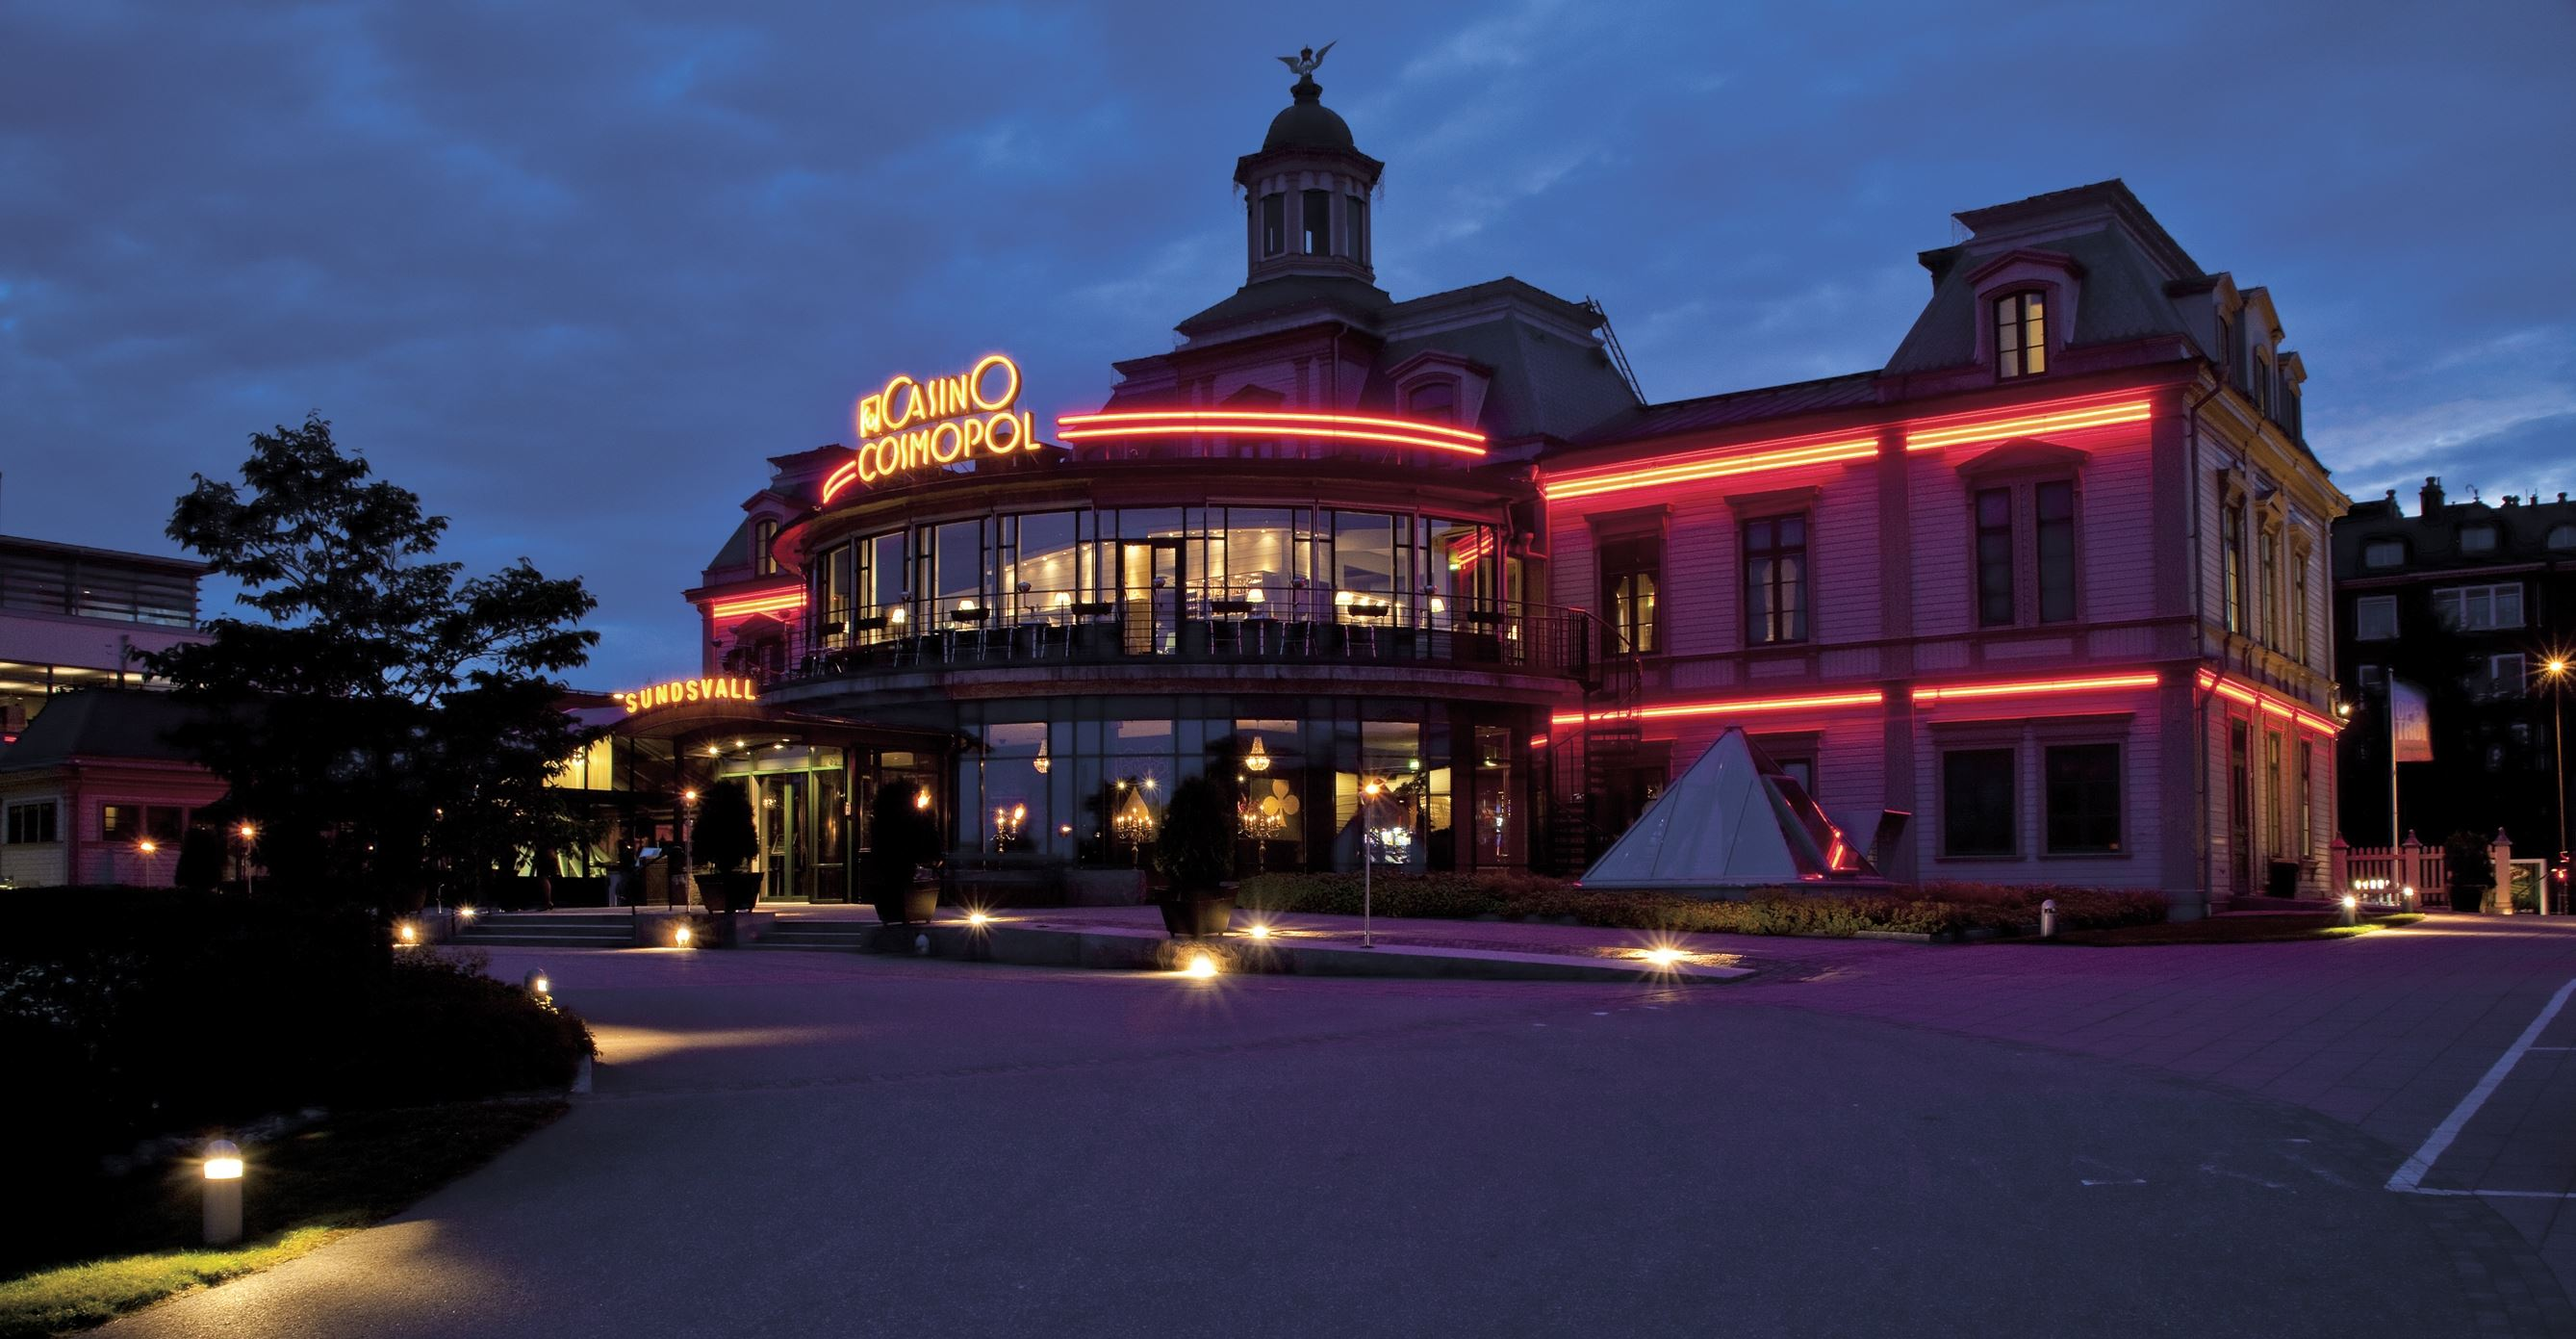 Nordic light poker - Casino Cosmopol